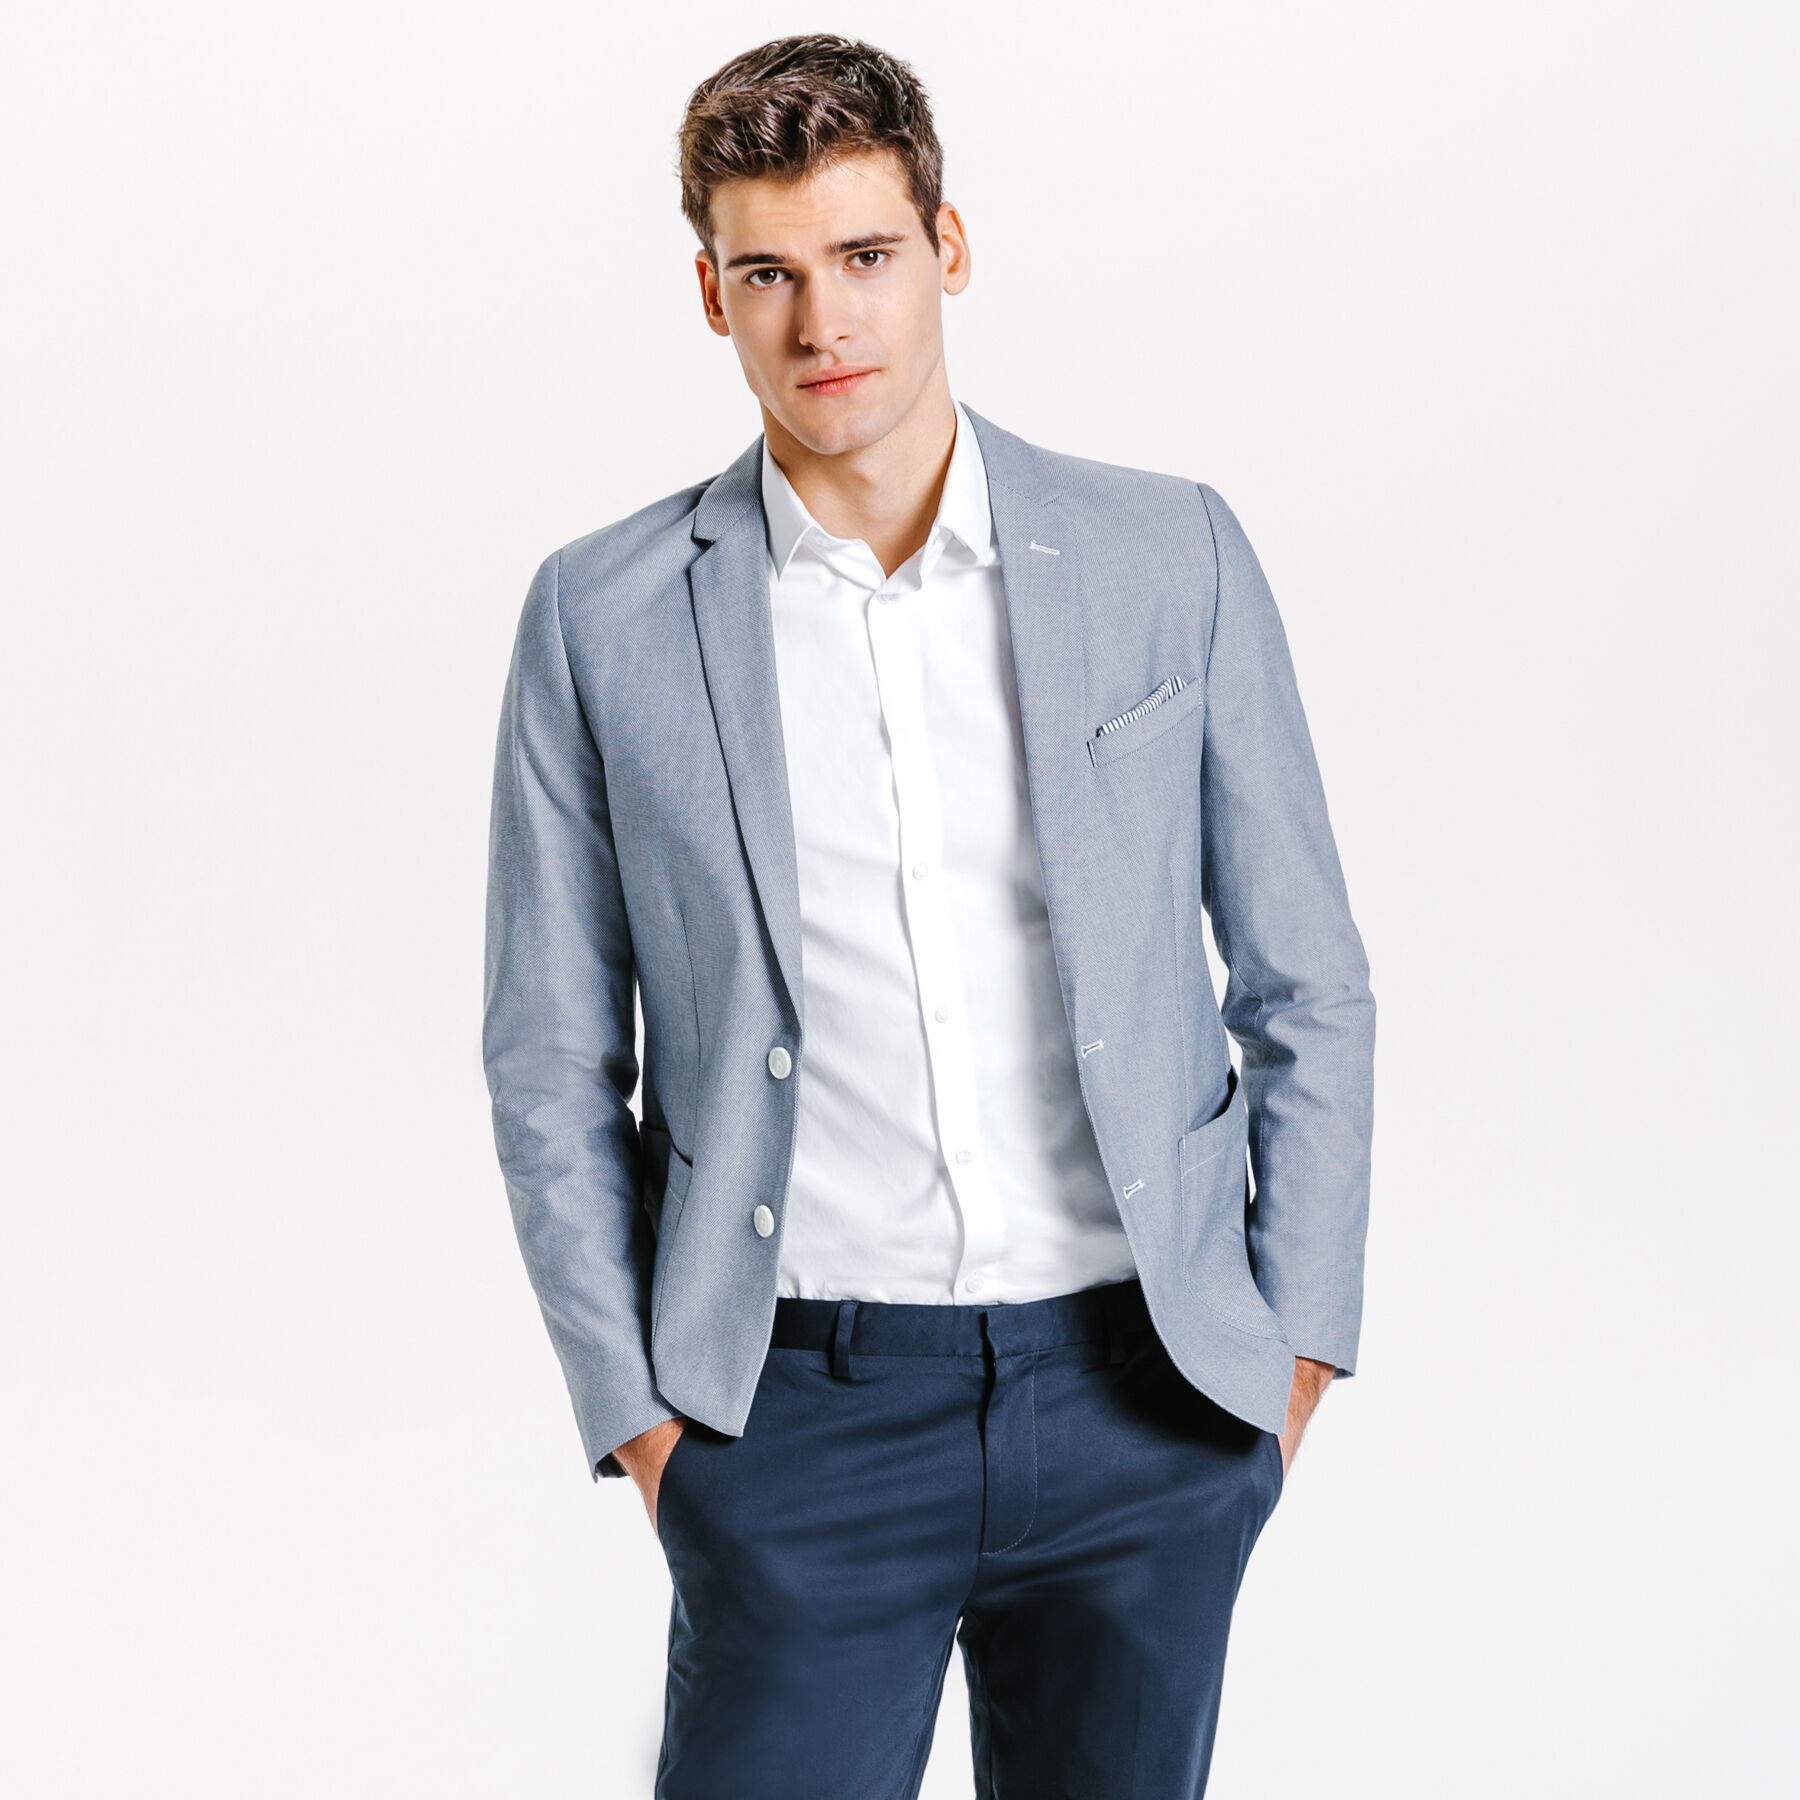 Veste blazer homme bleu clair